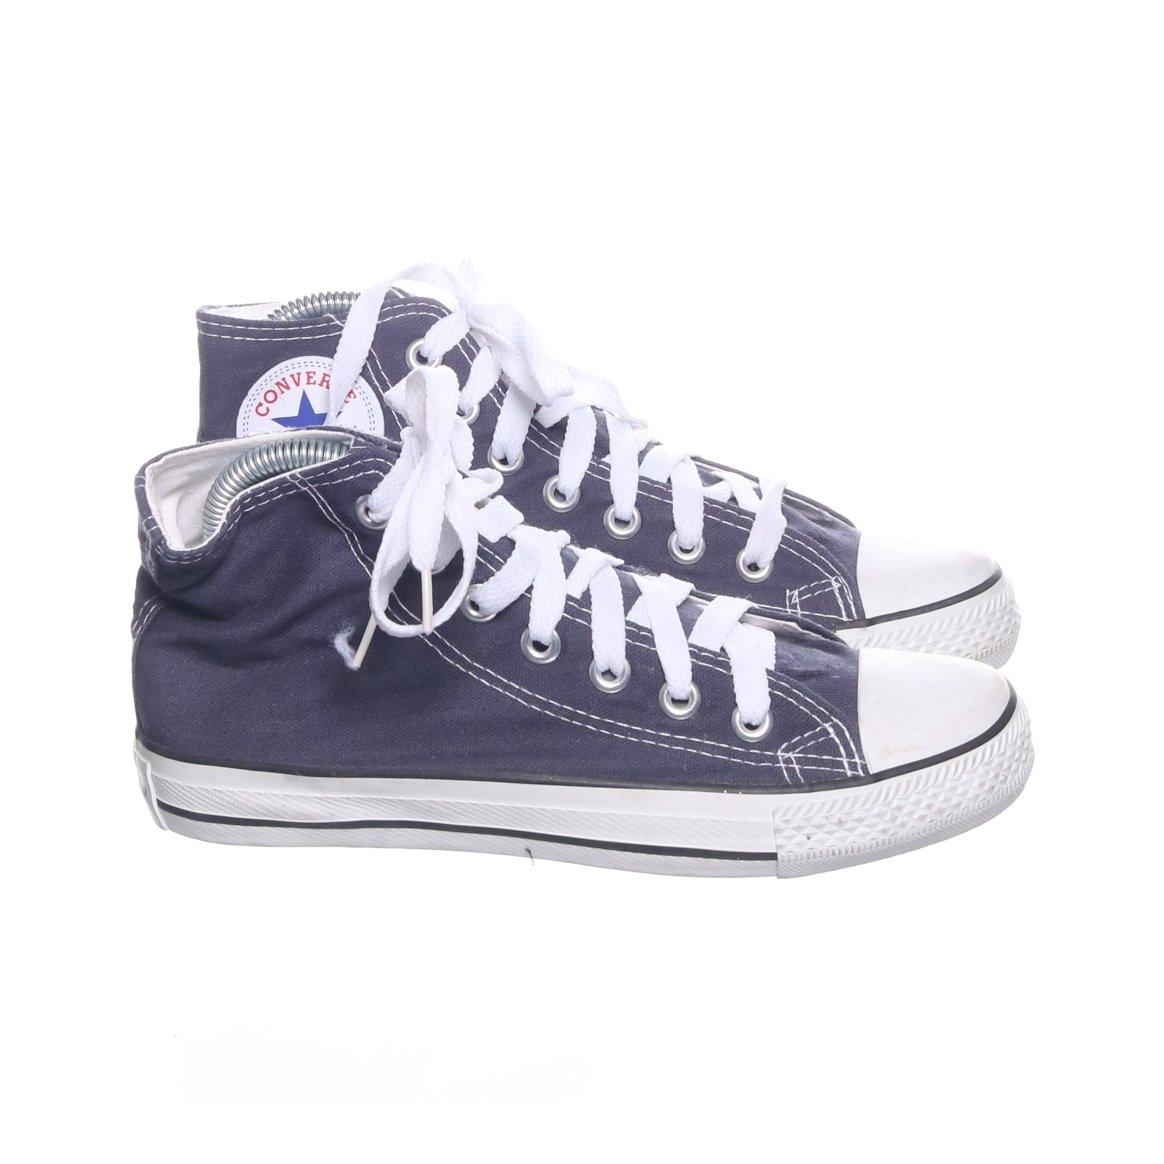 667261c1f15 Converse, Sneakers, Strl: 38, Nya skor, Blå (353373943) ᐈ Sellpy på ...